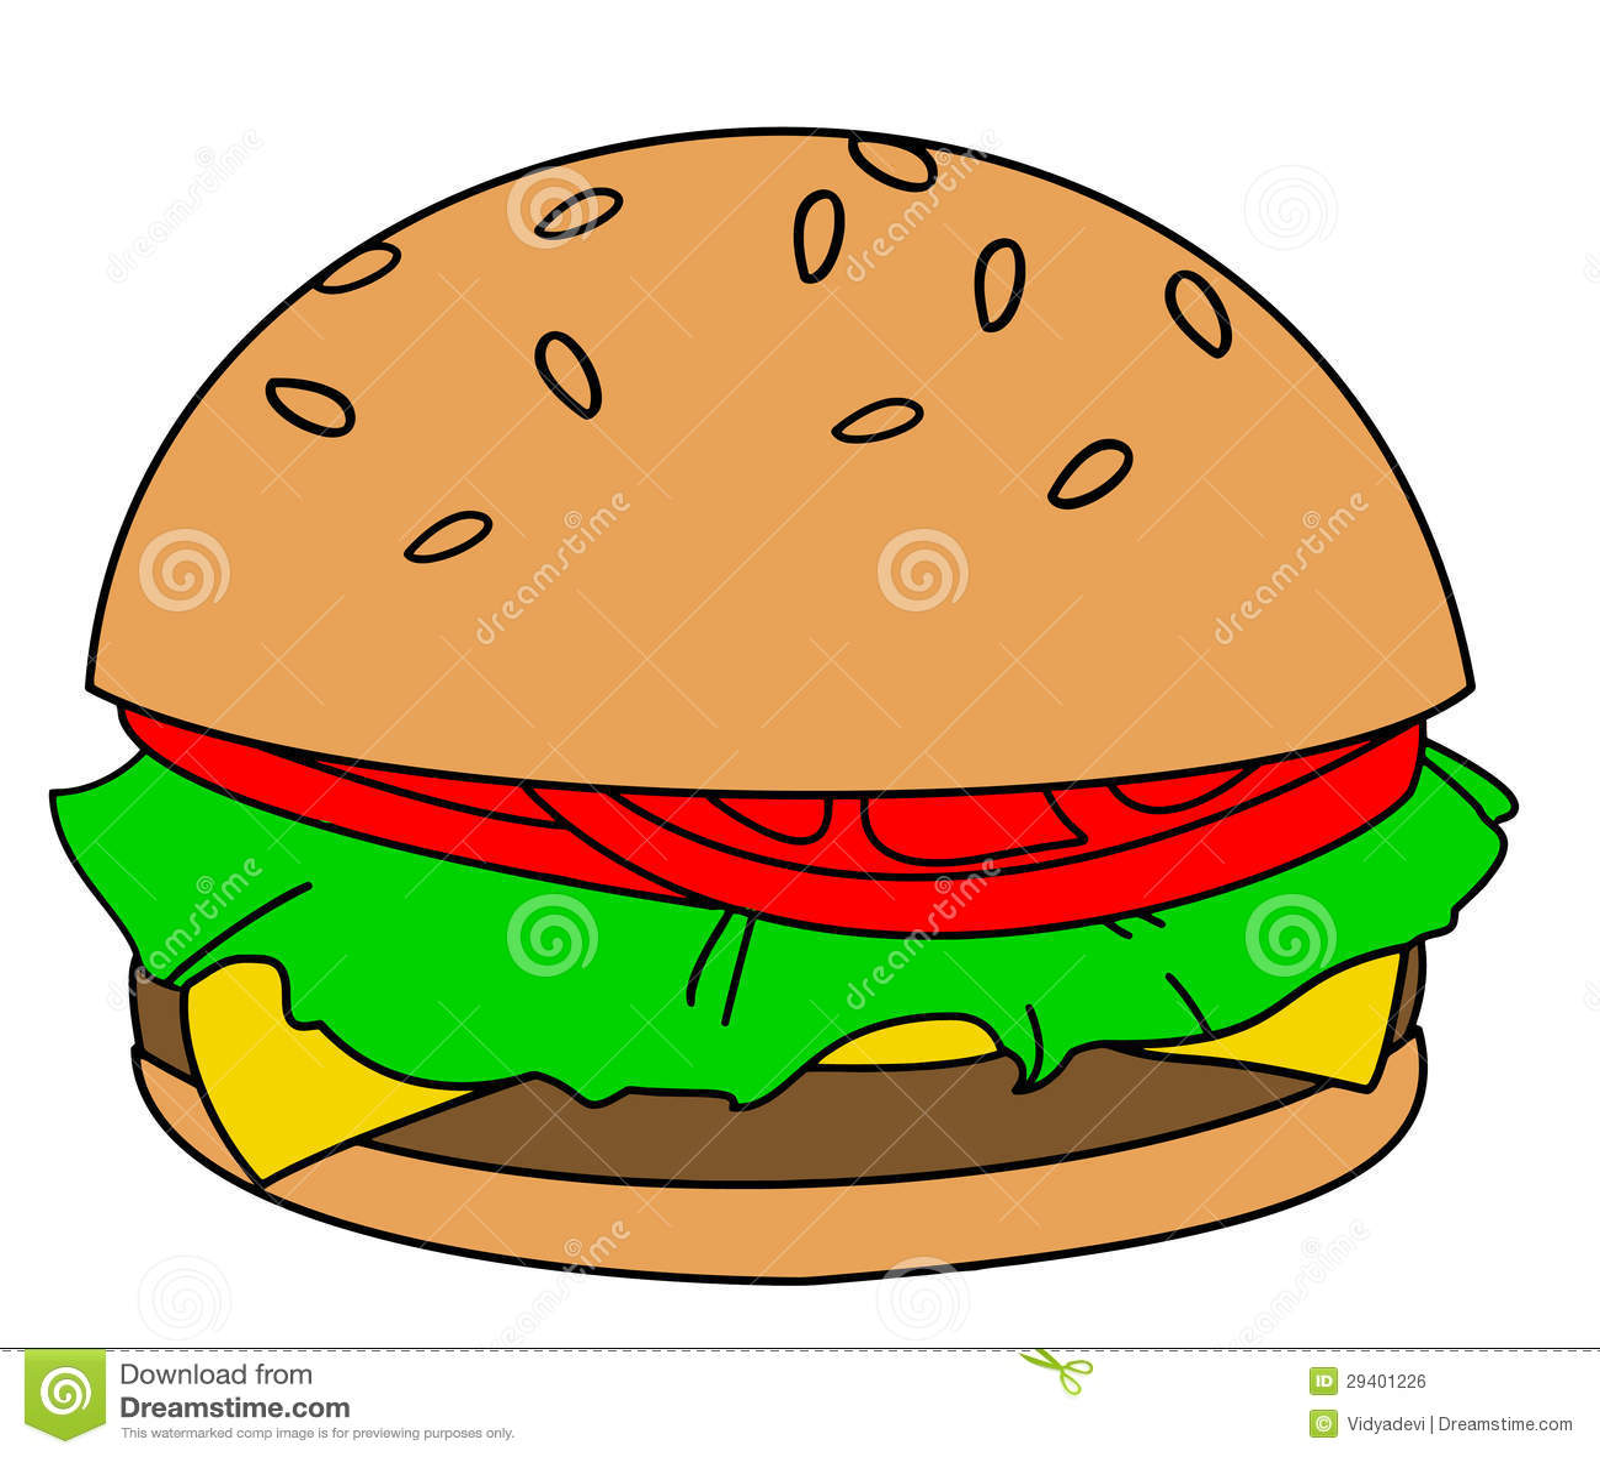 cartoon hamburger royalty free stock image image 29401226 free clipart elf hat free elf clipart images